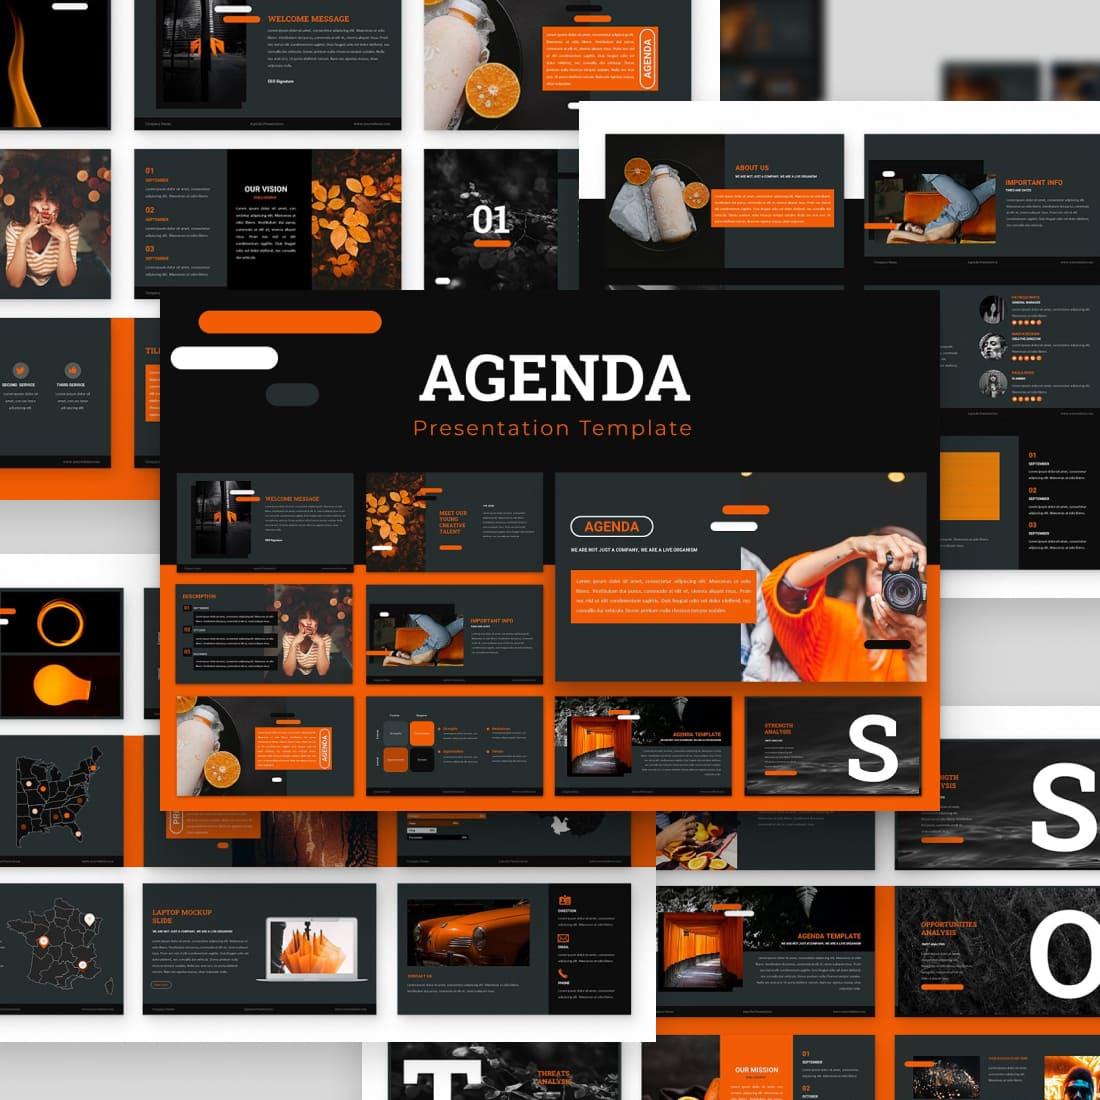 Agenda Powerpoint Presentation by MasterBundles.